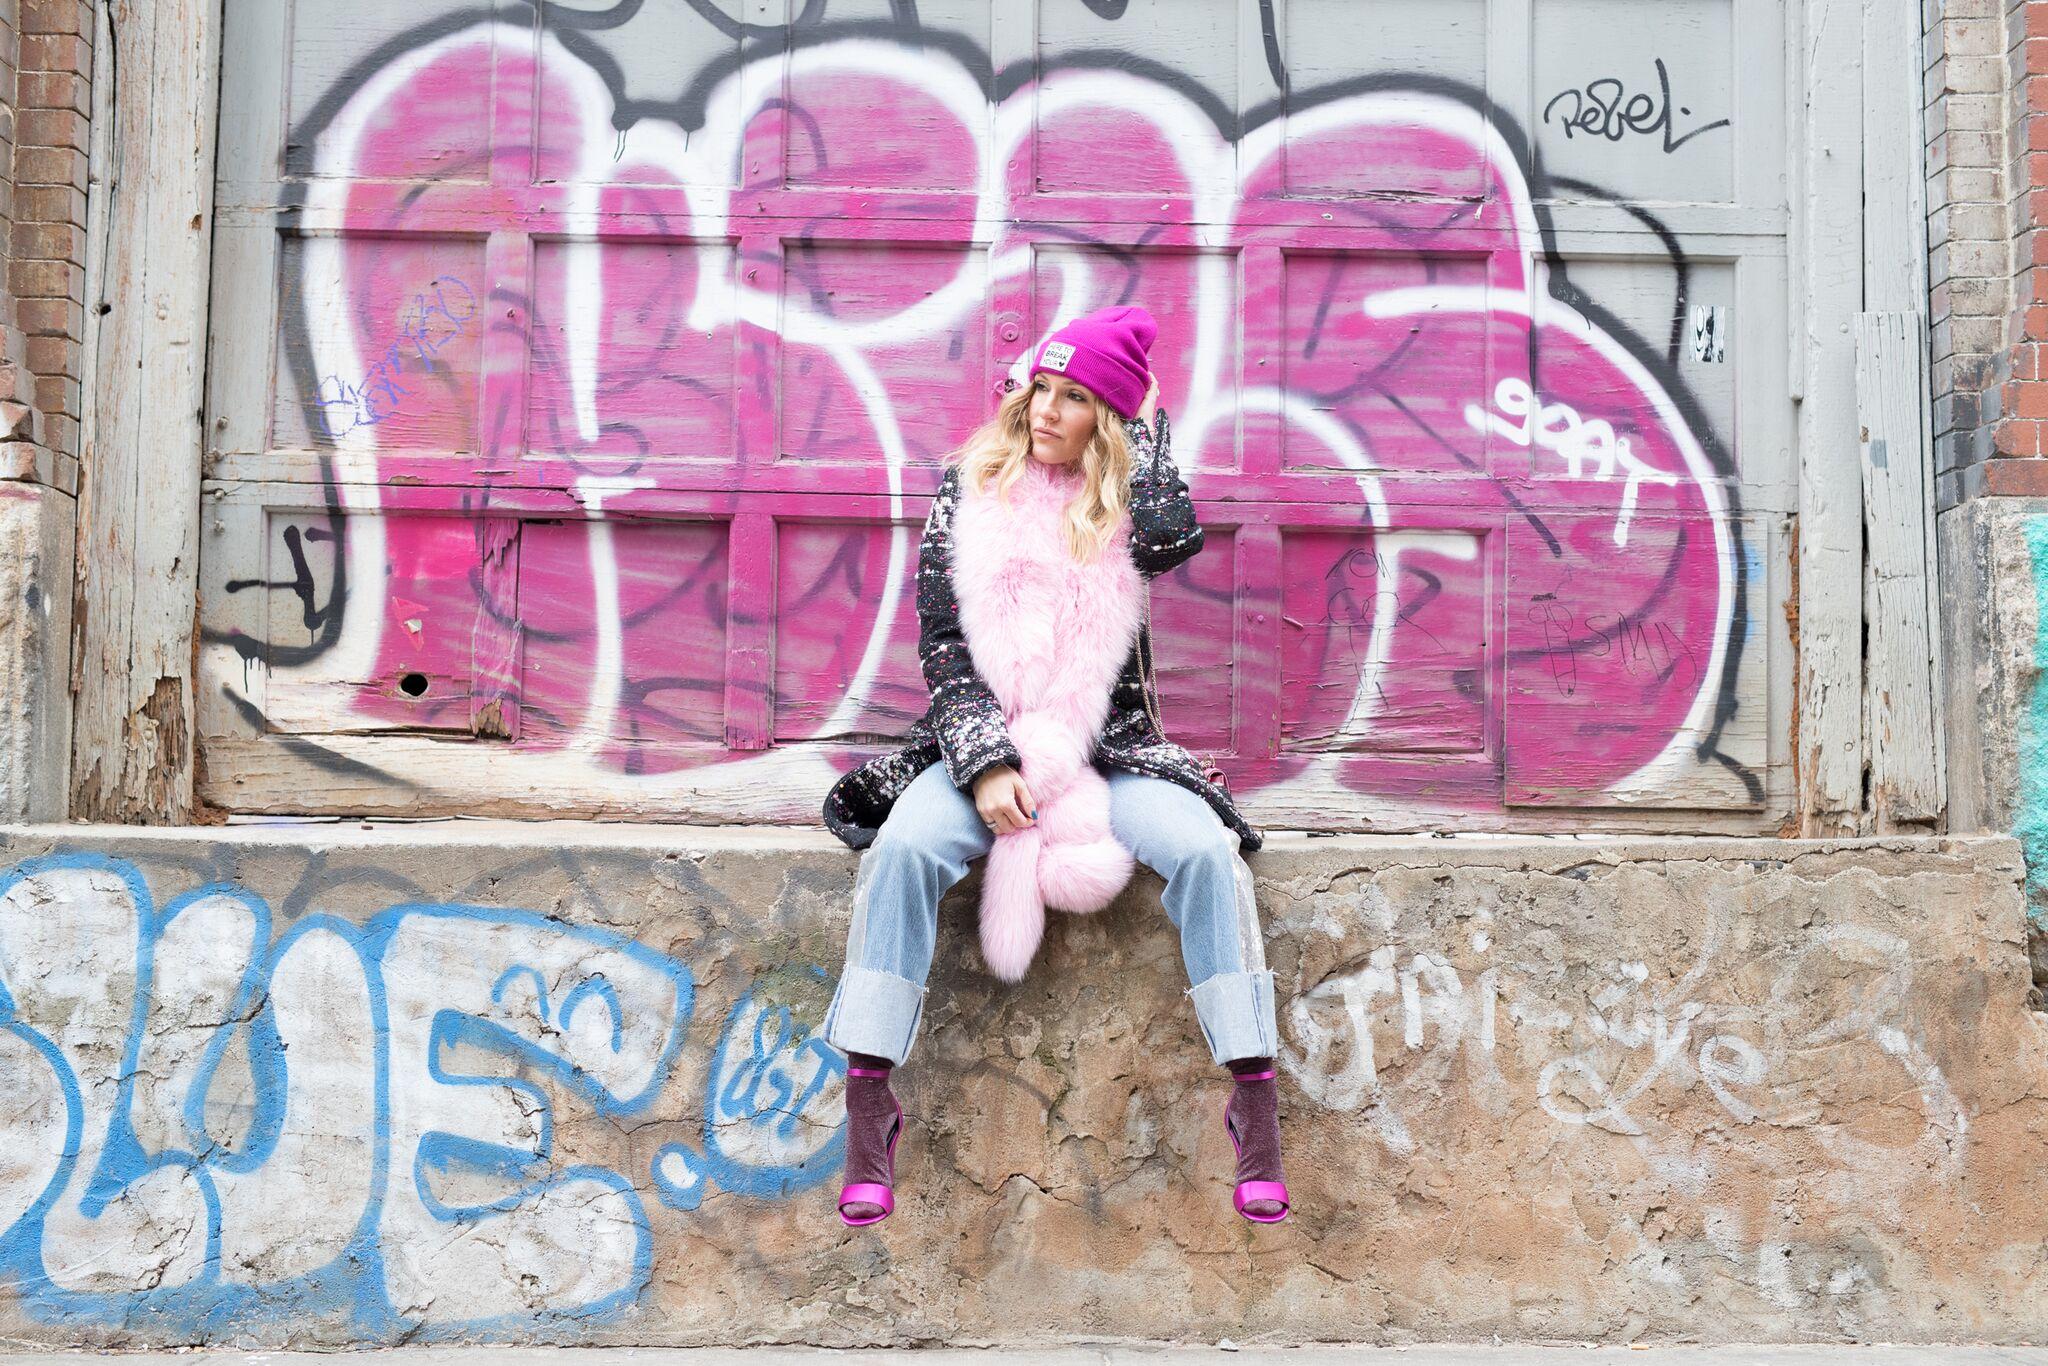 Mademoiselle jules fashion beauty blogger montreal canada holt renfrew